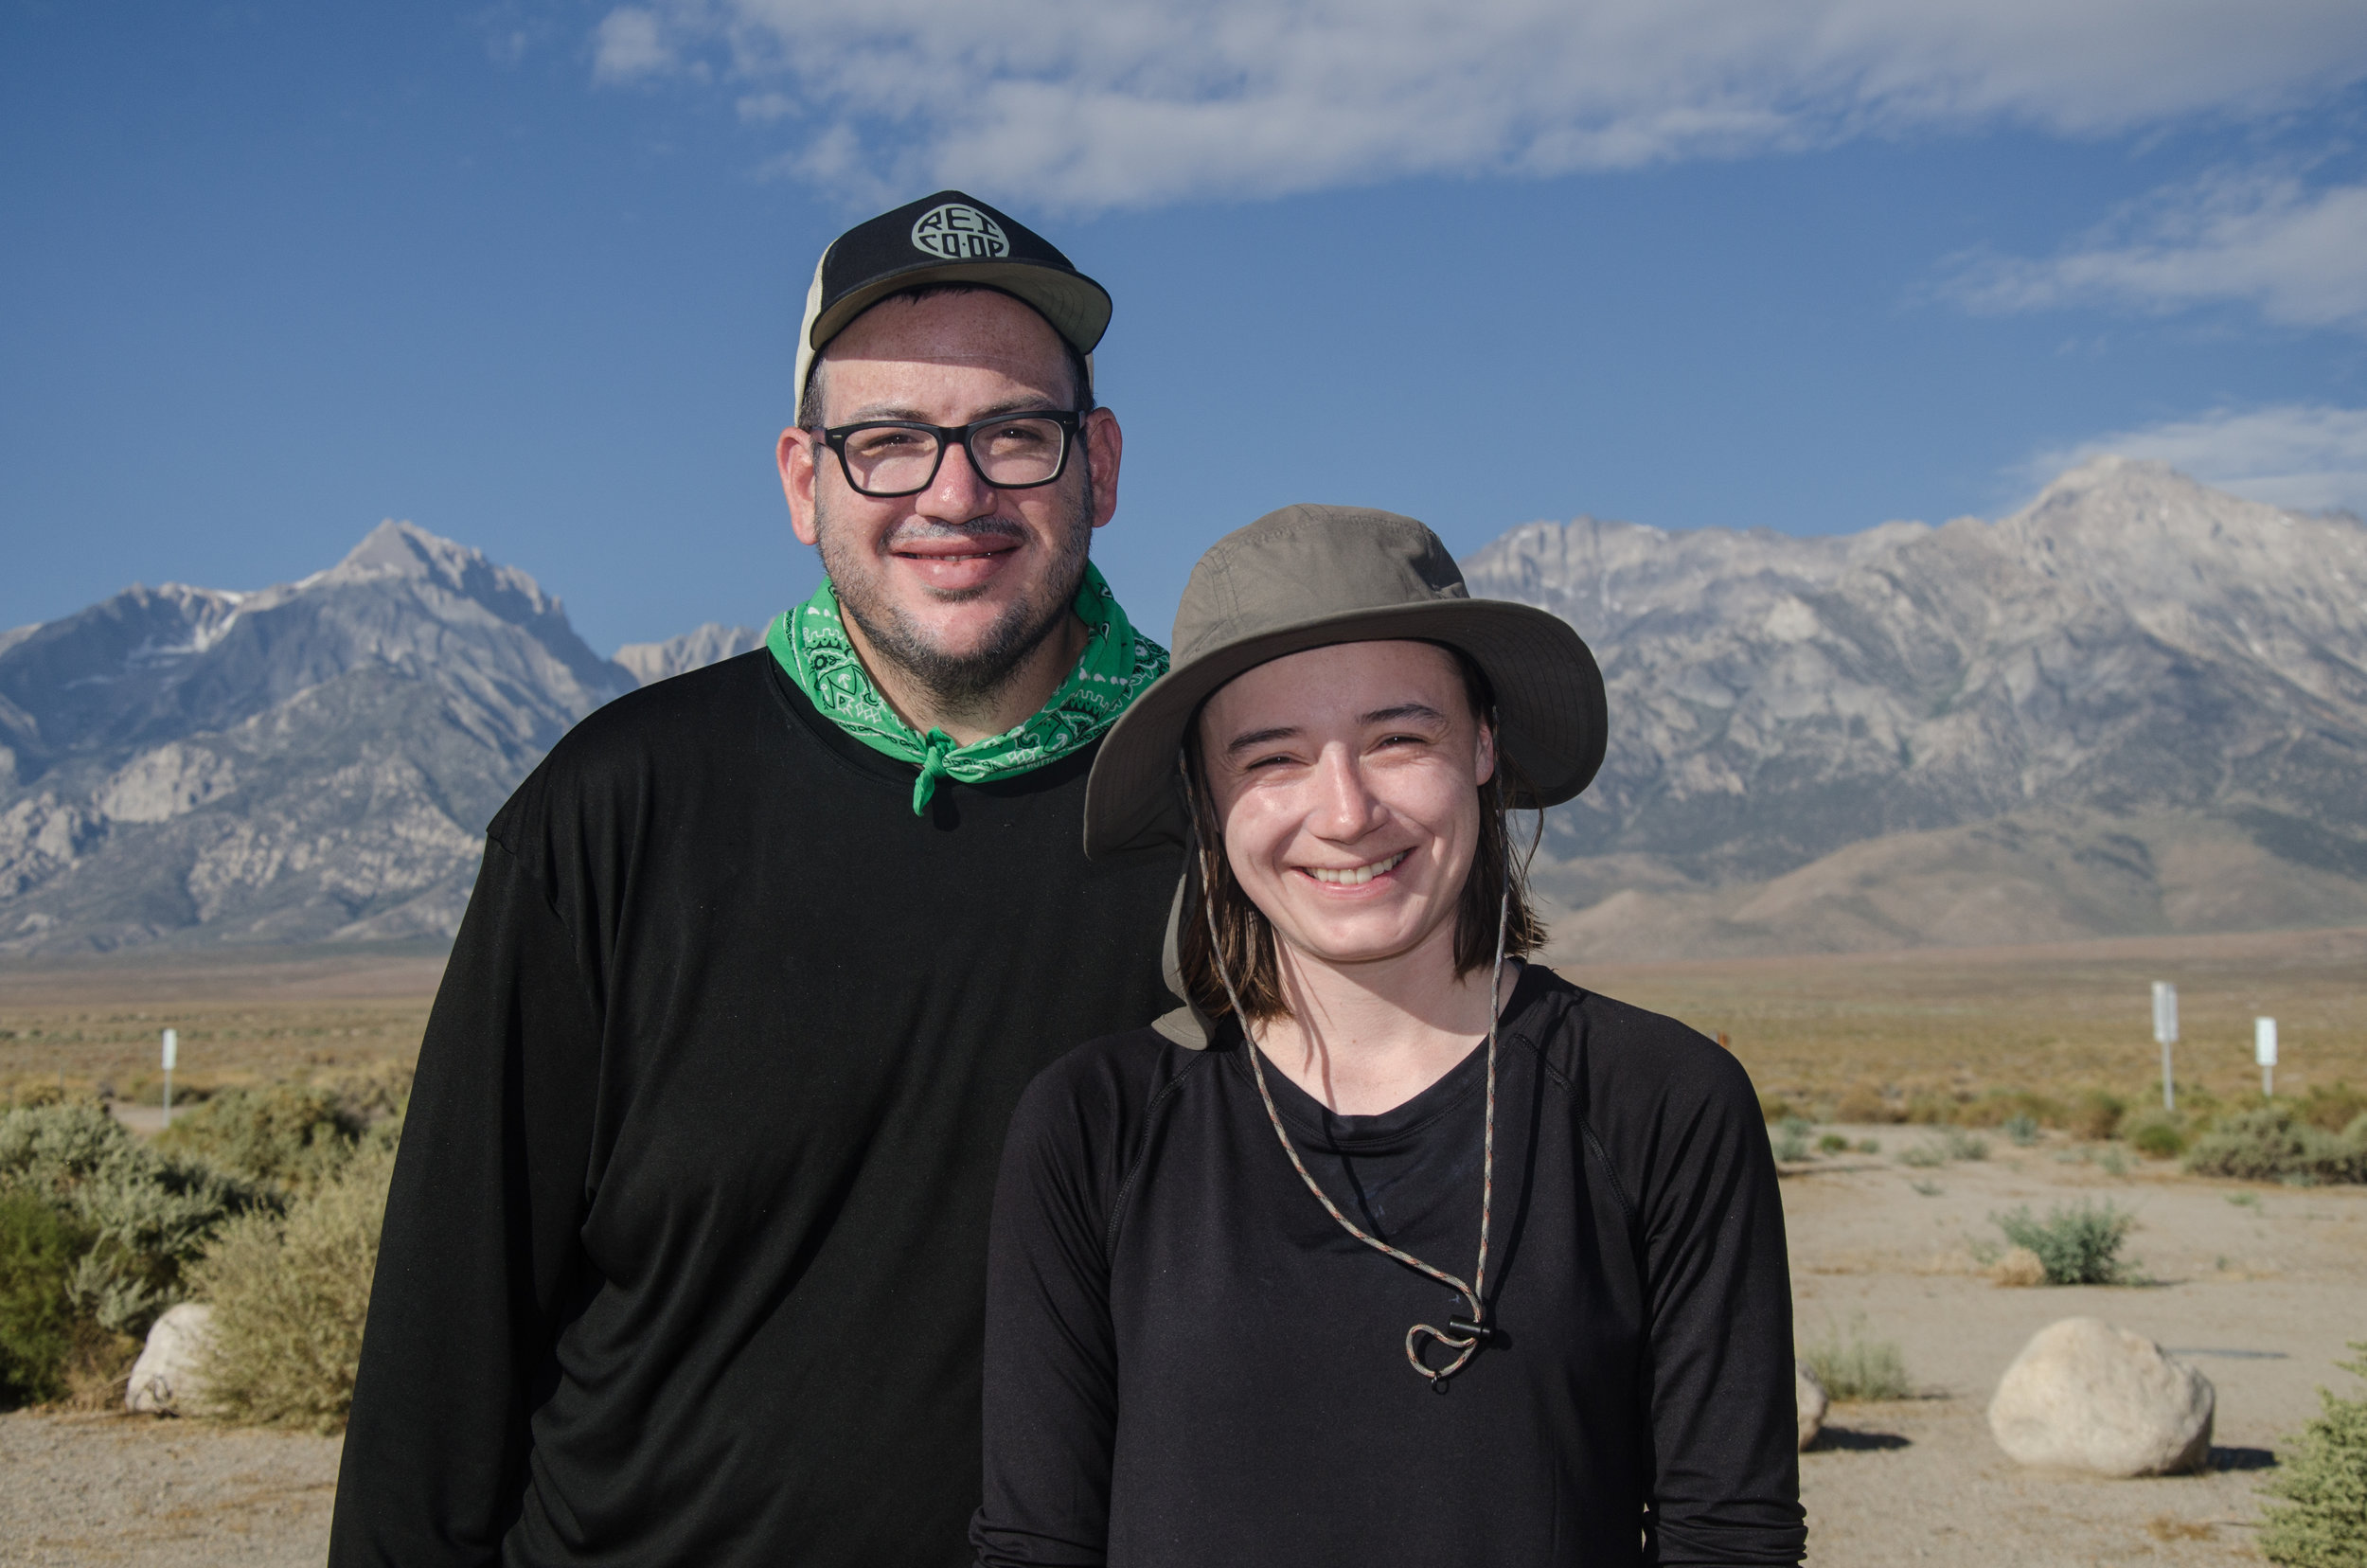 JMT Hikers Andrew and Raquel